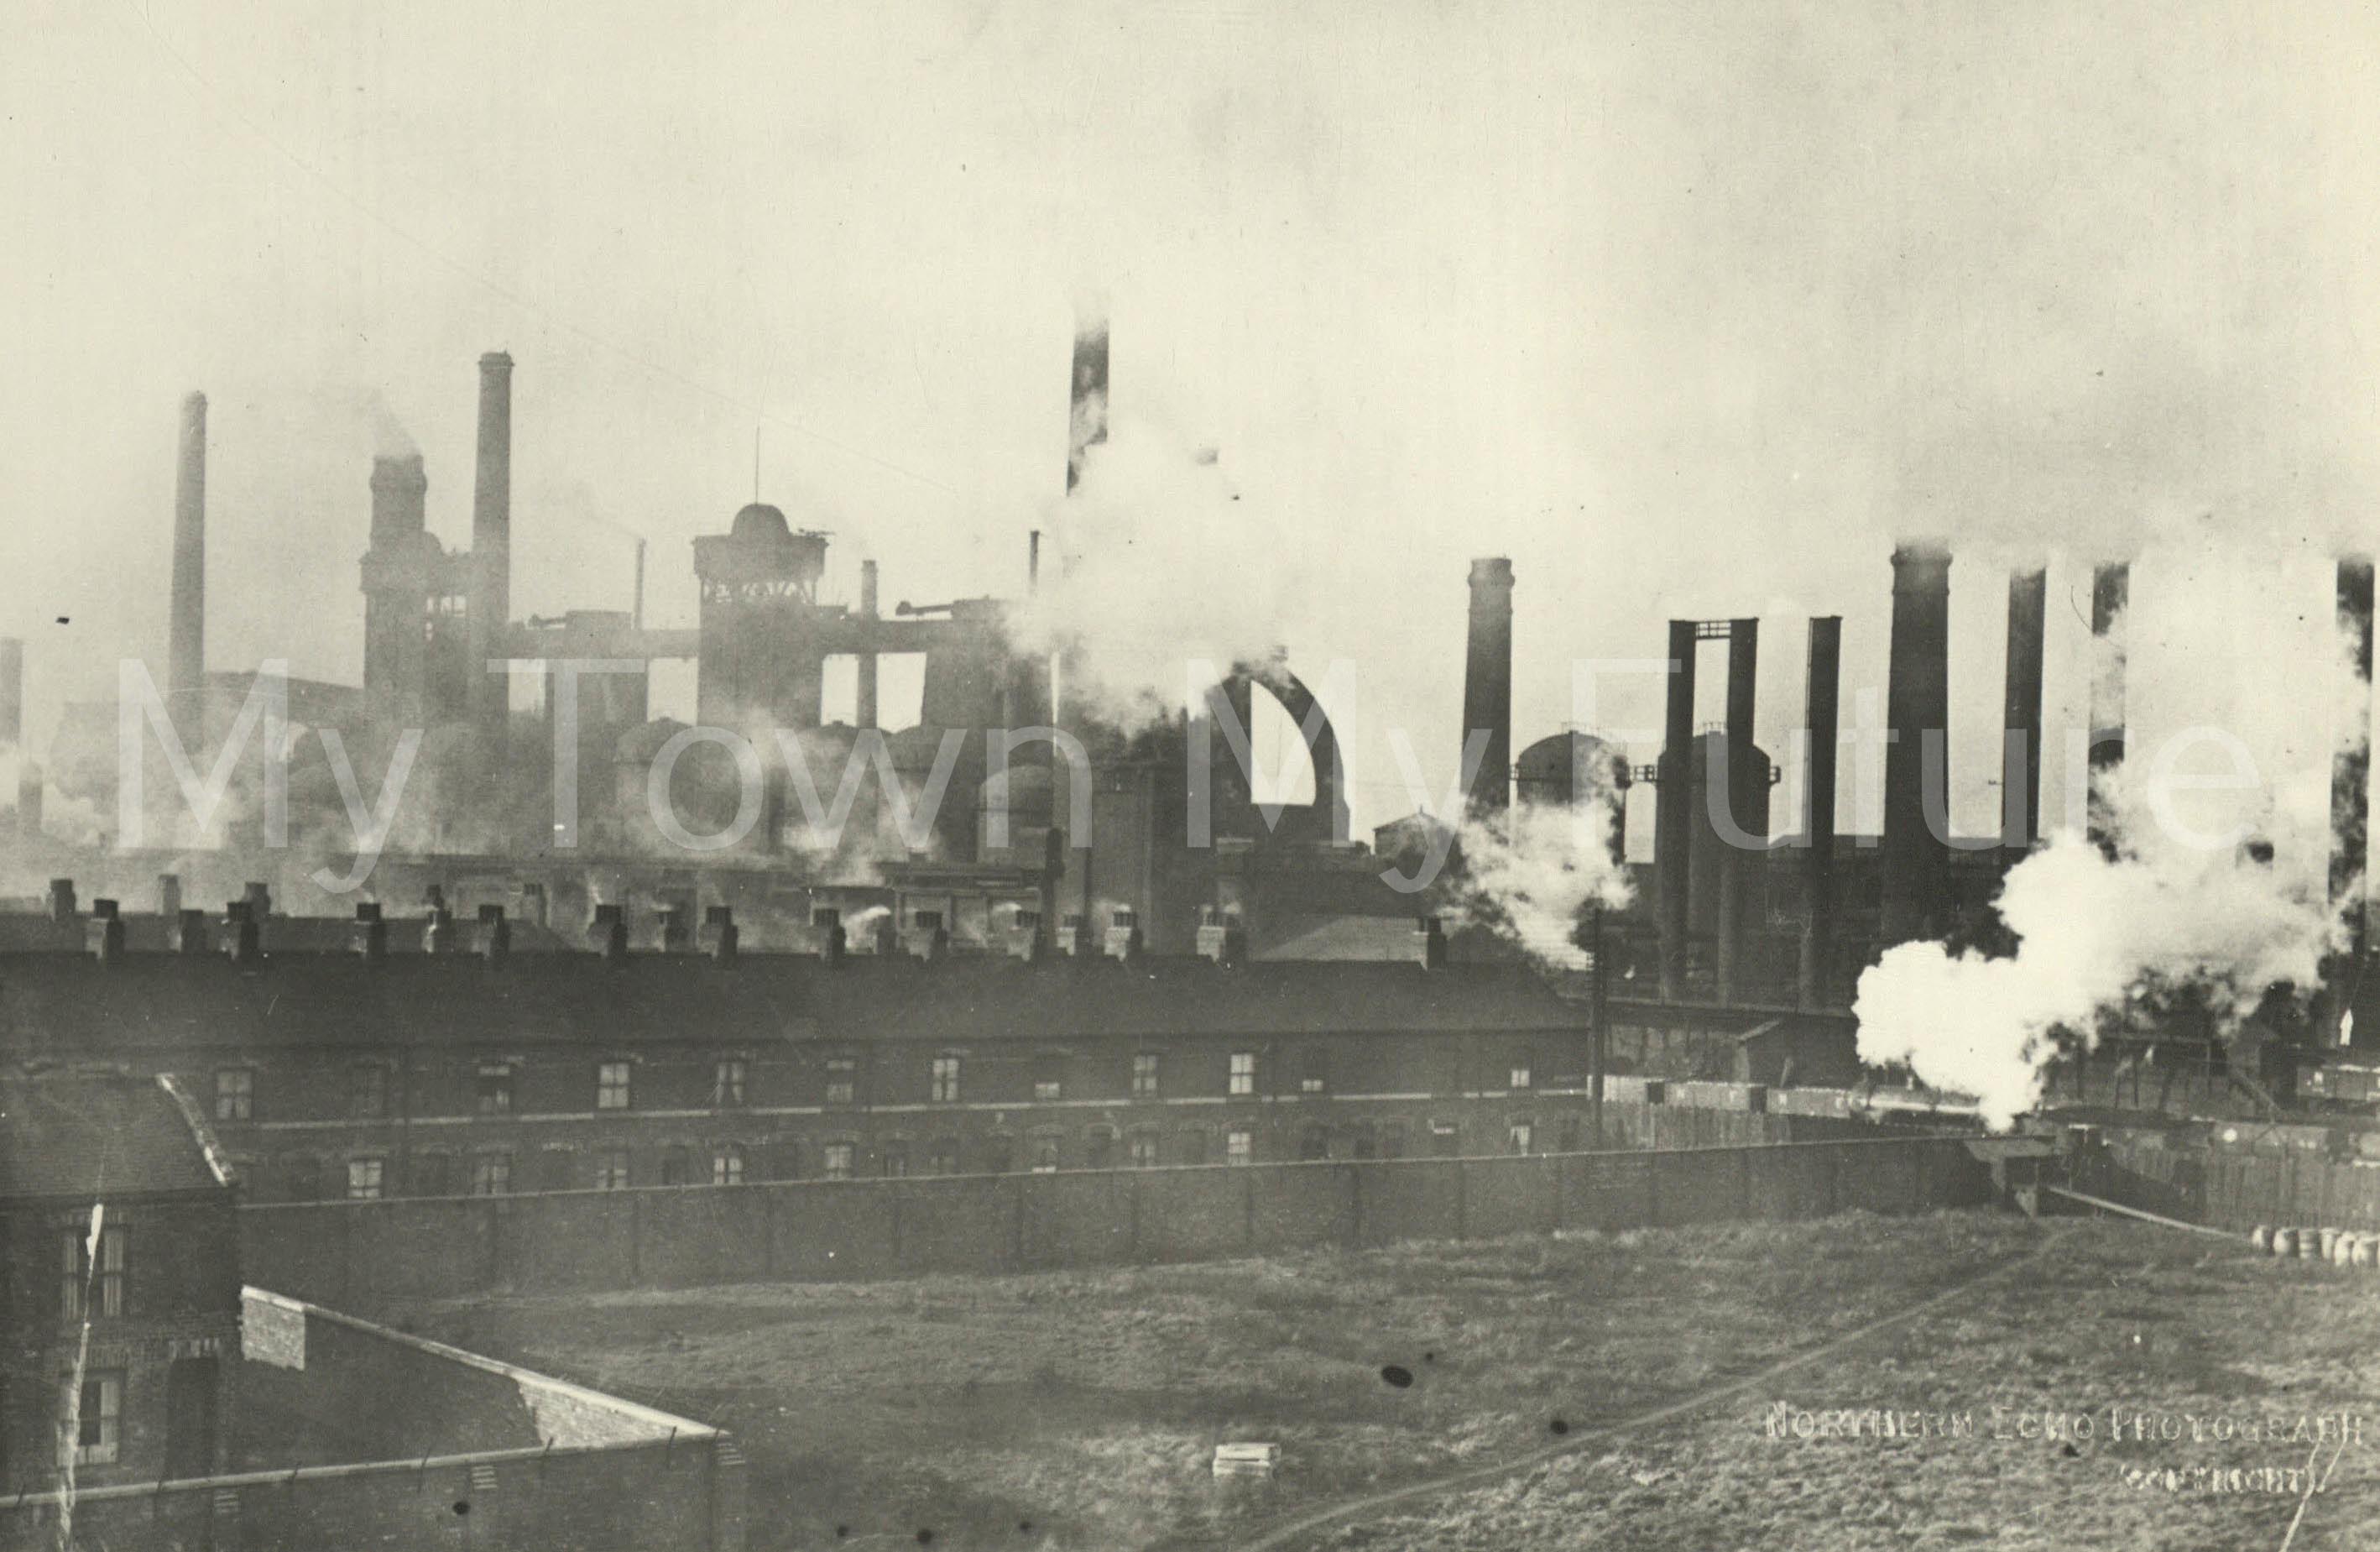 Newport Ironworks